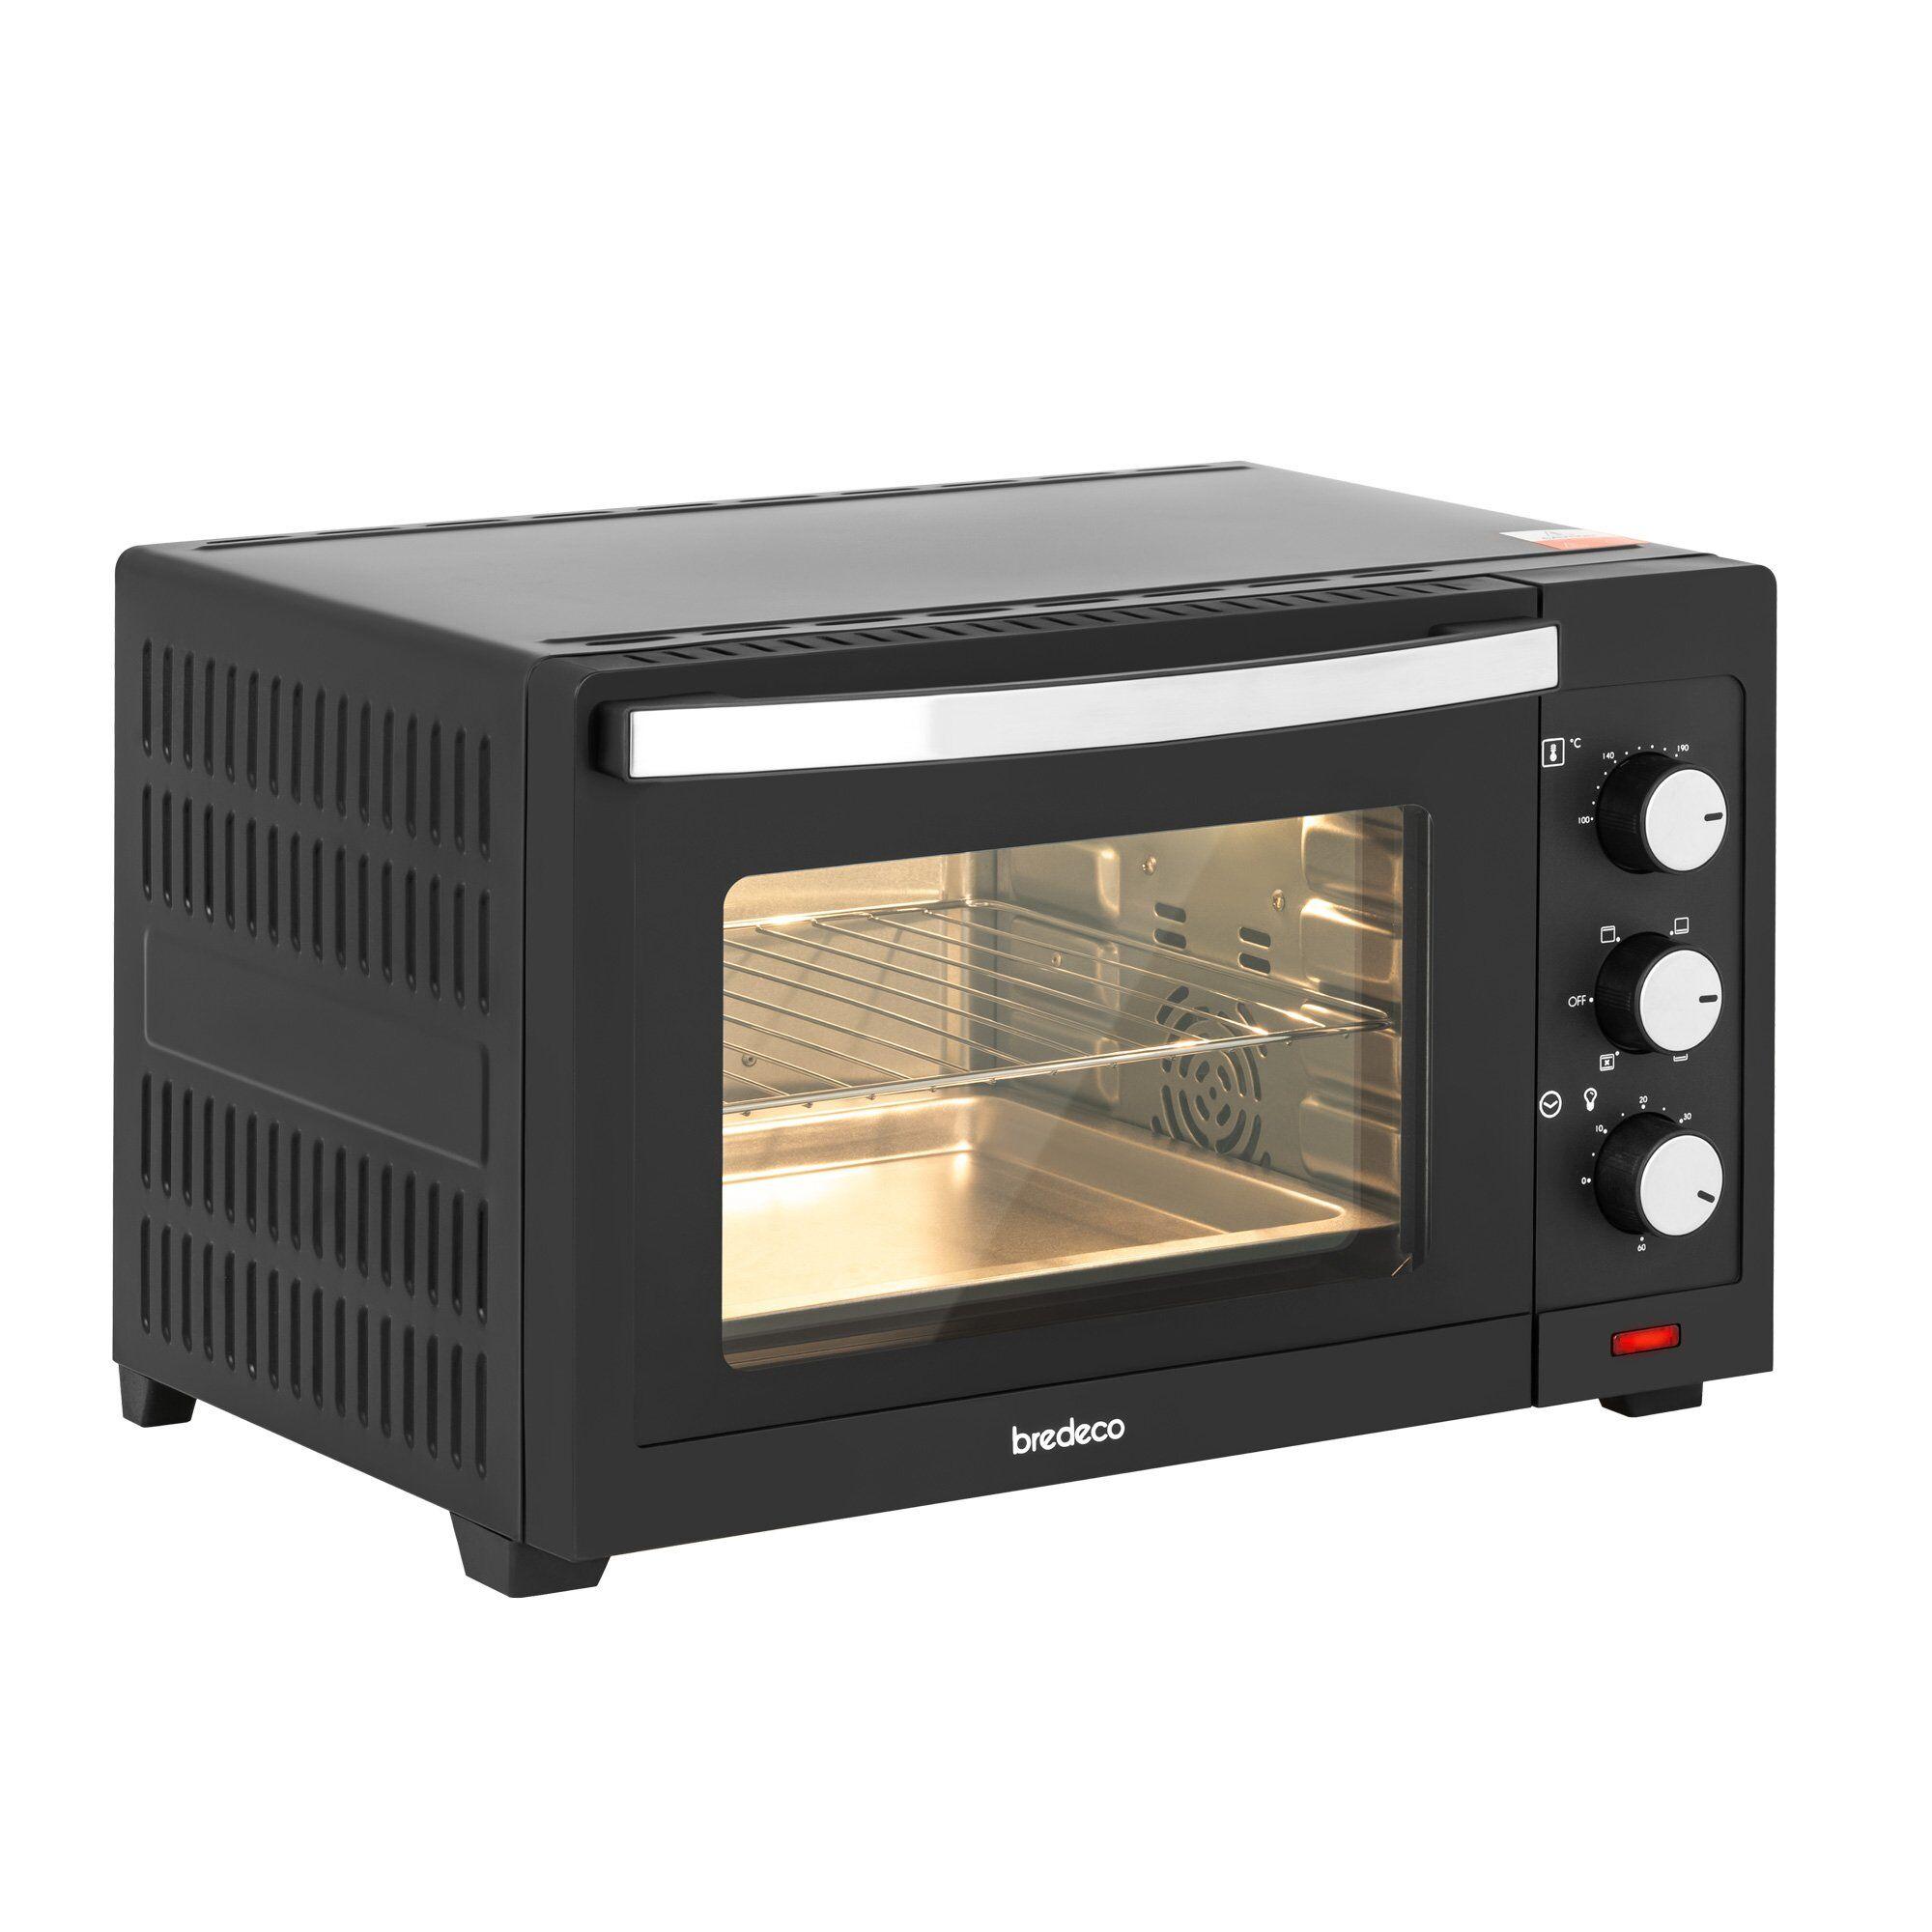 bredeco Mini-four - 1 600 W - 30 l - 5 programmes BCMO-30L